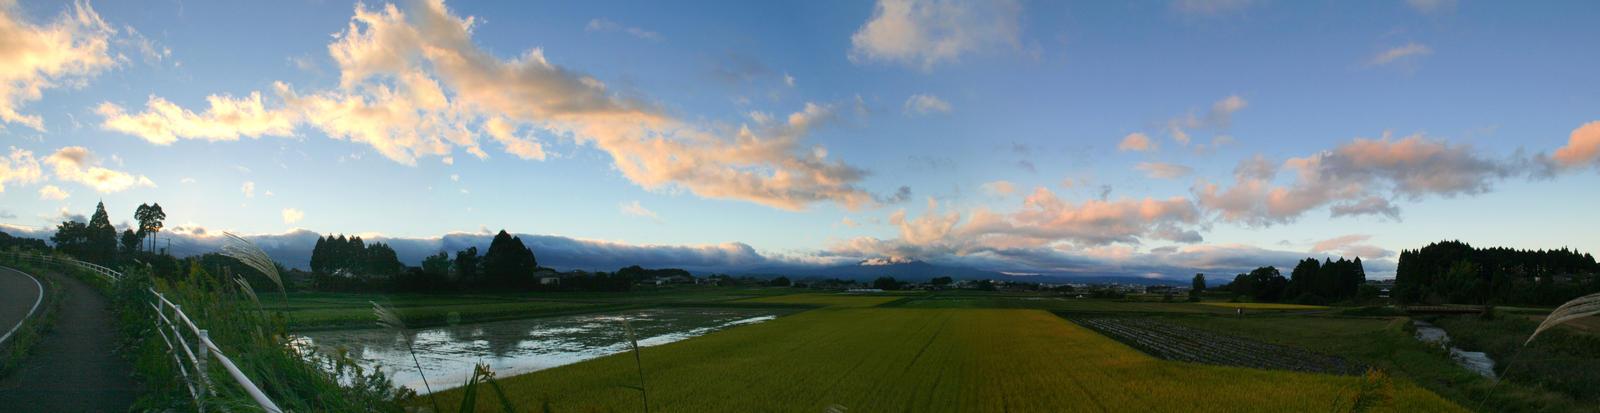 Panoramic Inaka - 01 by caffinefreek